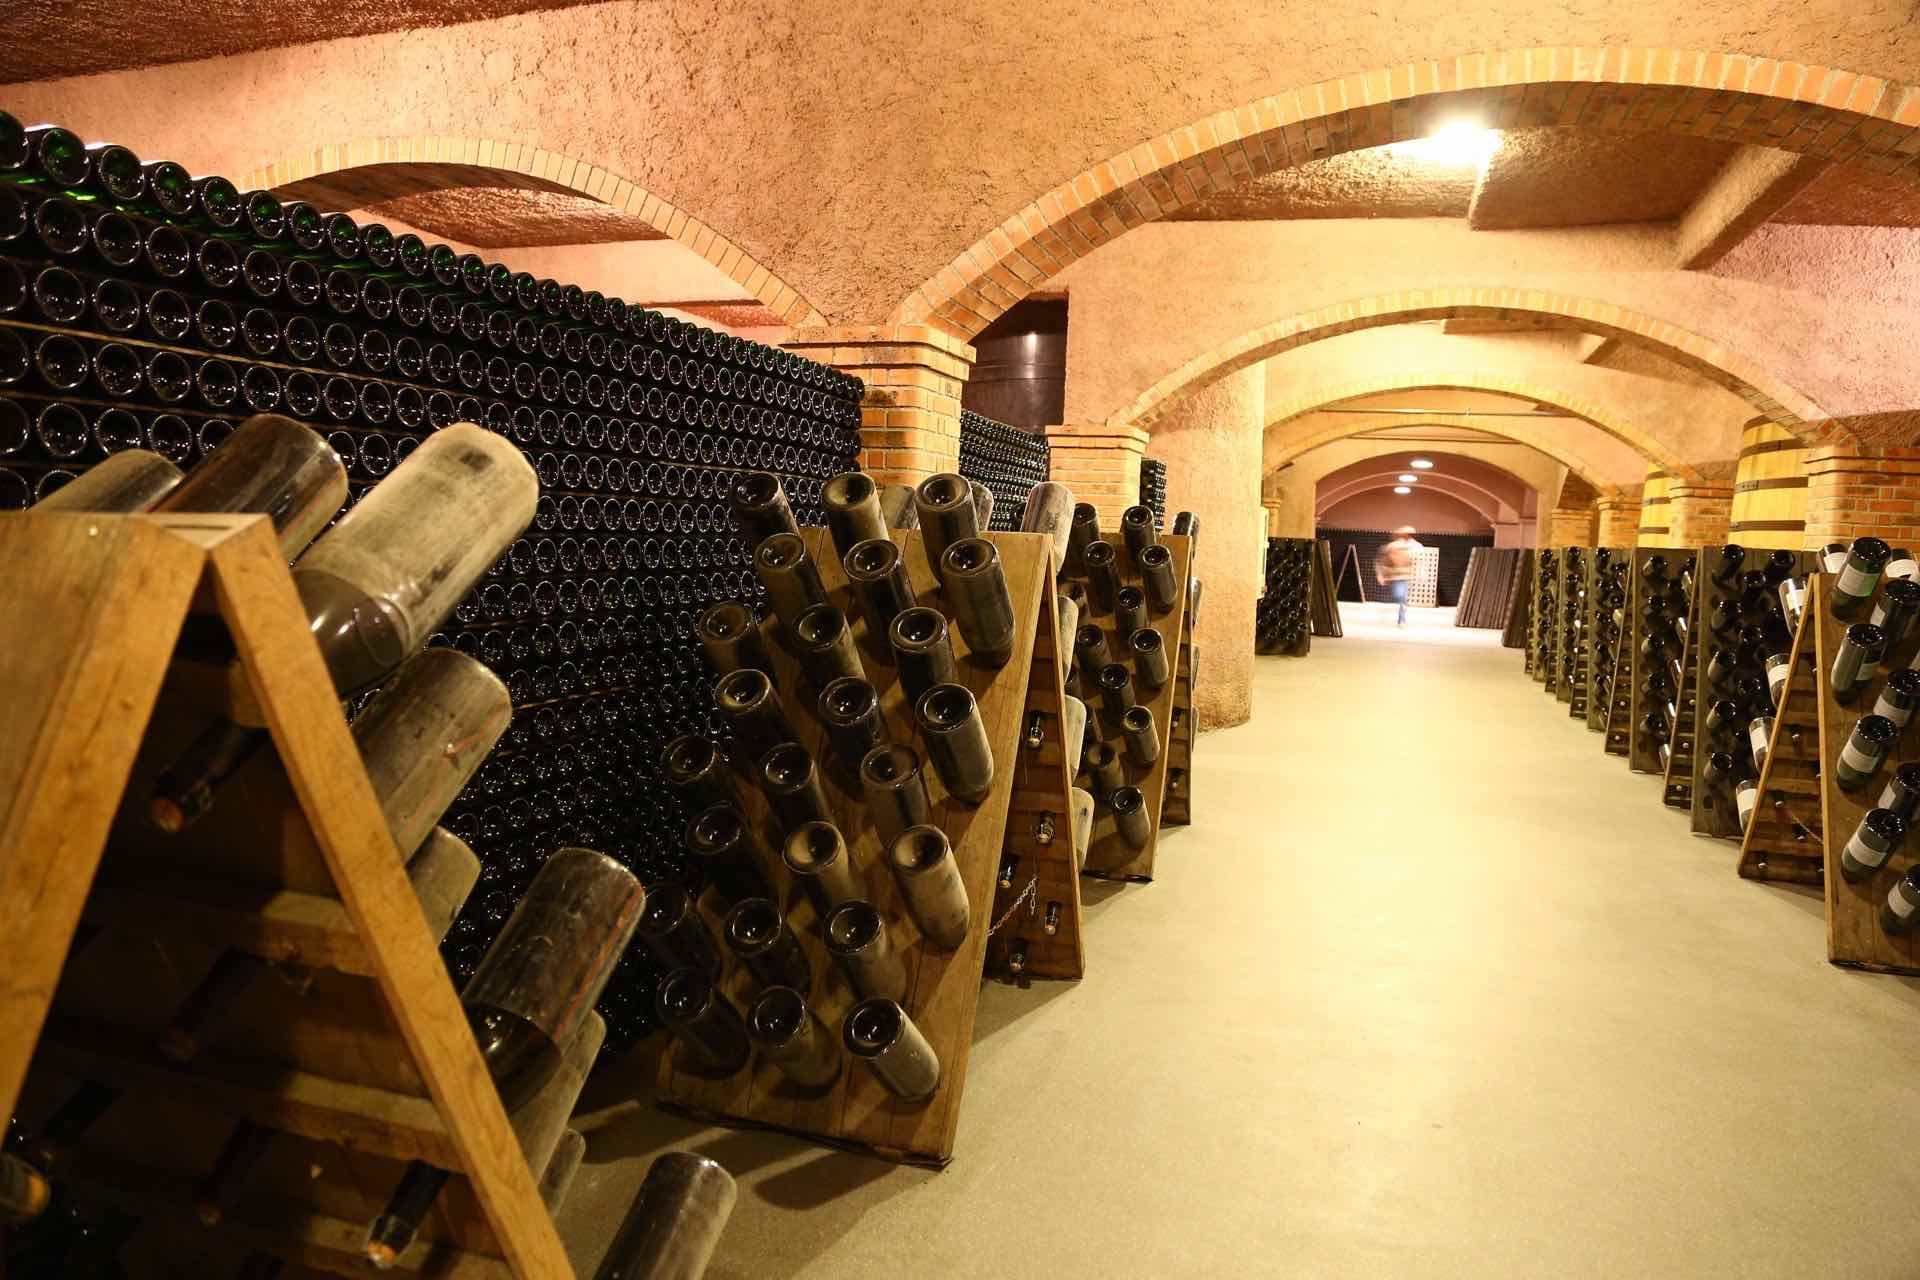 Domaine Drappier - アペロ ワインバー / apéro WINEBAR - vins et petits plats français - Minami Aoyama Tokyo